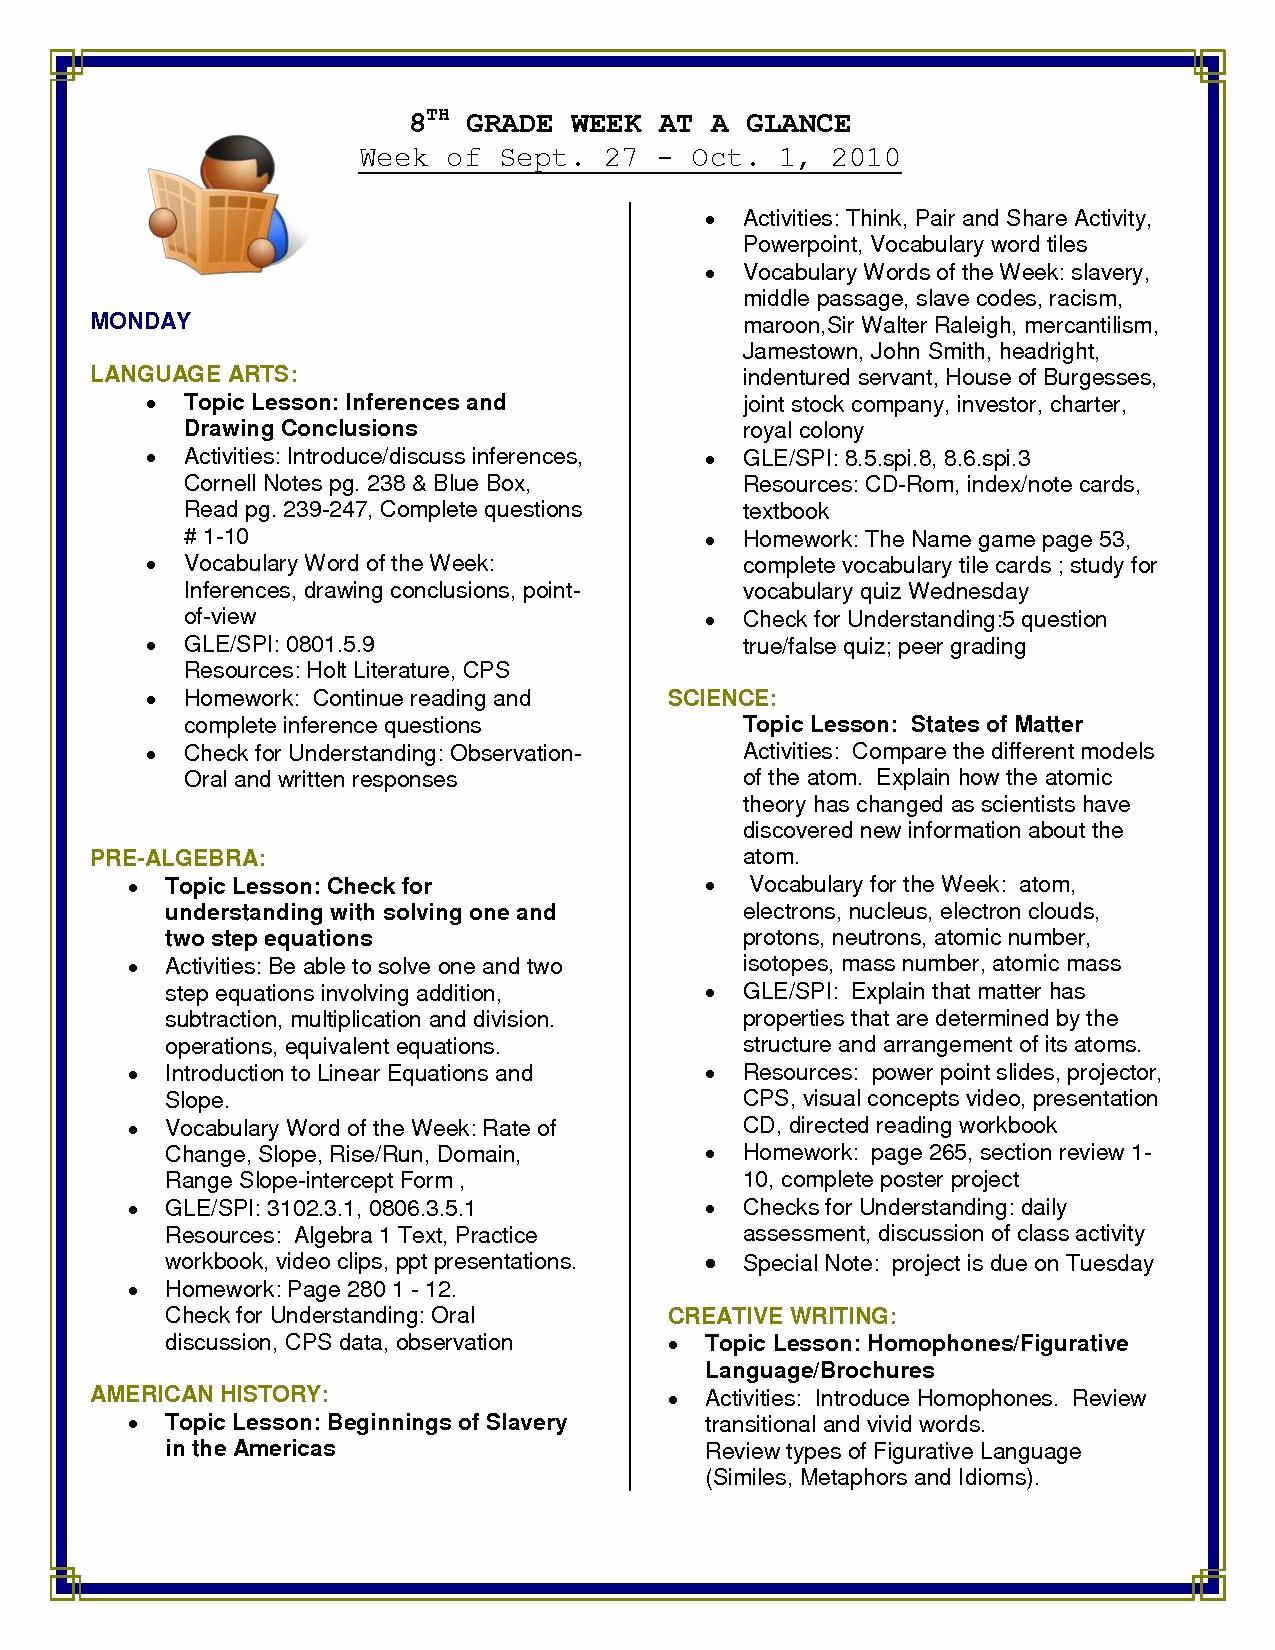 8th Grade Reading Worksheets Elegant Free Printable 8th Grade Reading Prehension Worksheets